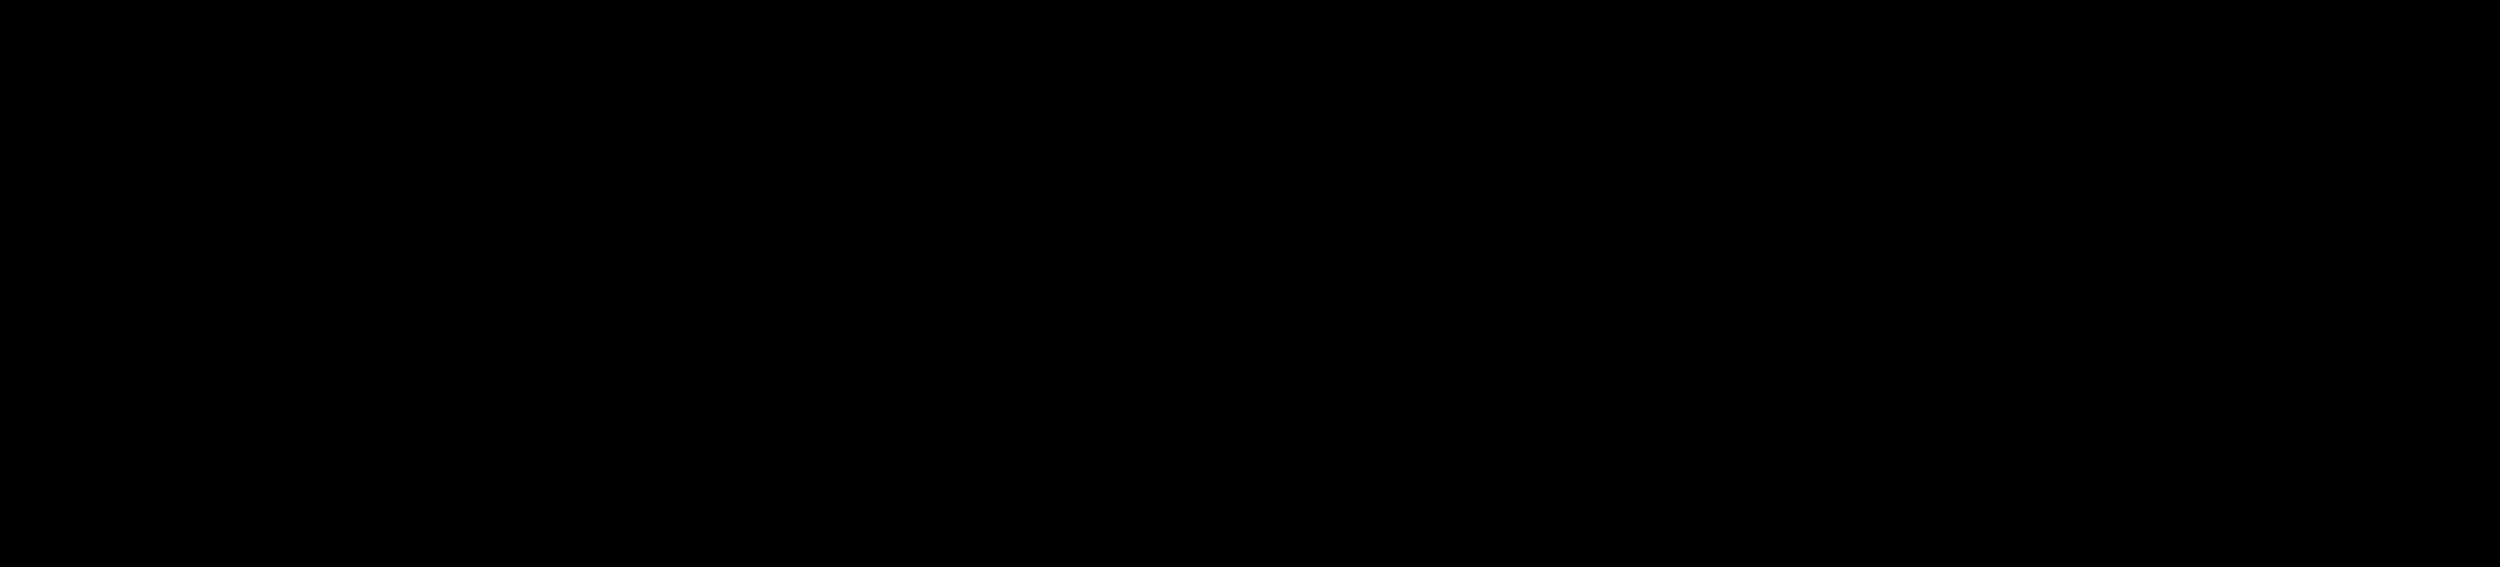 BLACK_Washington Hilton_logo.png